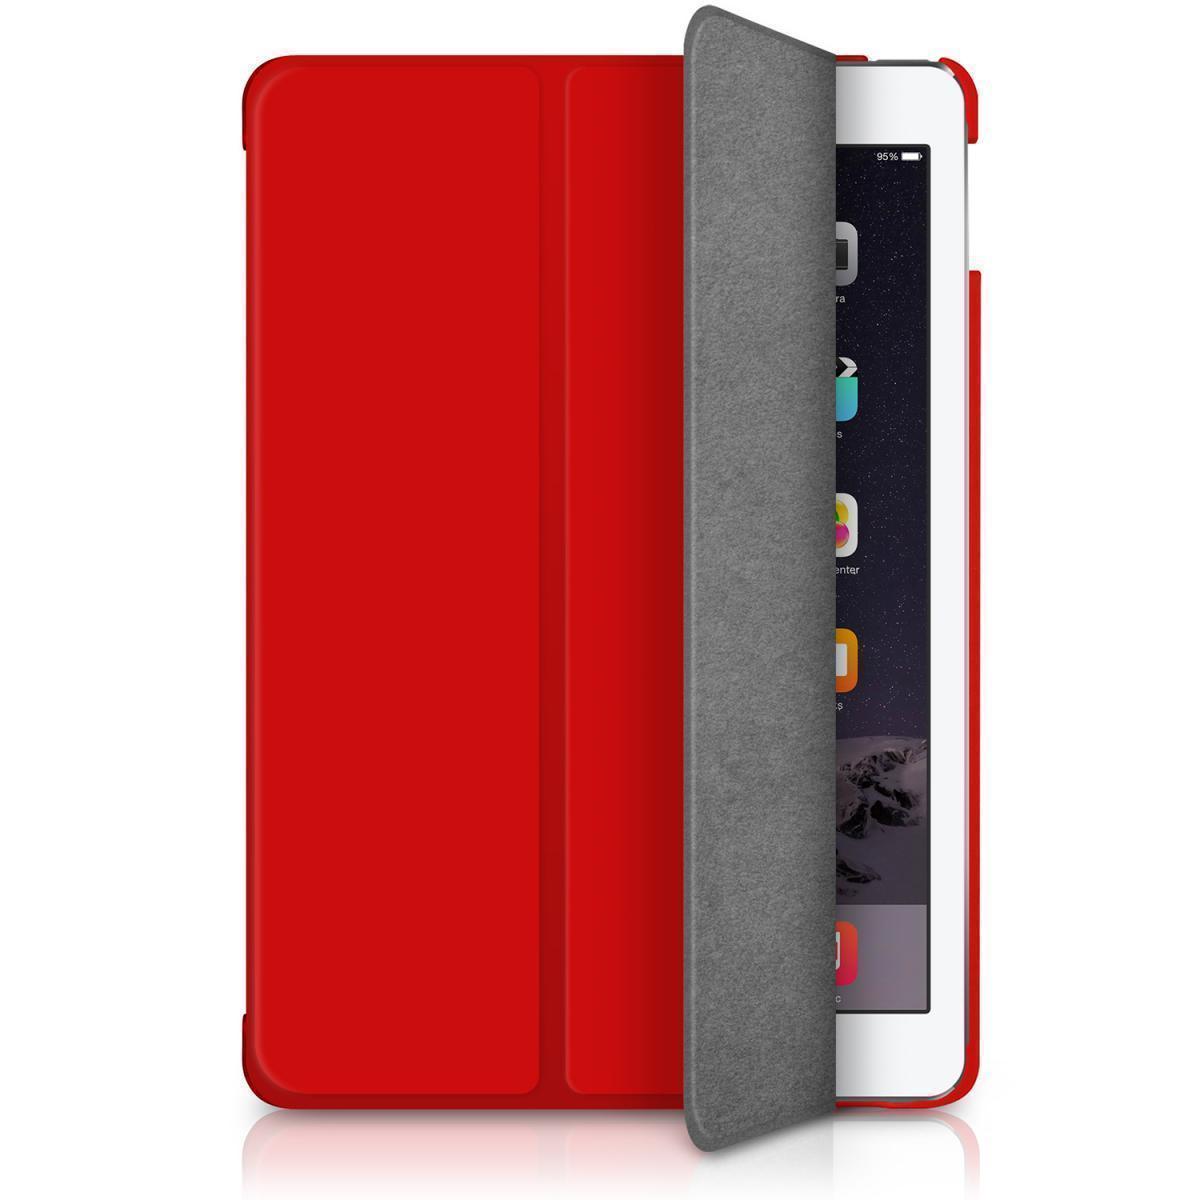 Чехол-книжка MacAlly для Apple iPad Air (полиуретан с подставкой) бордовый